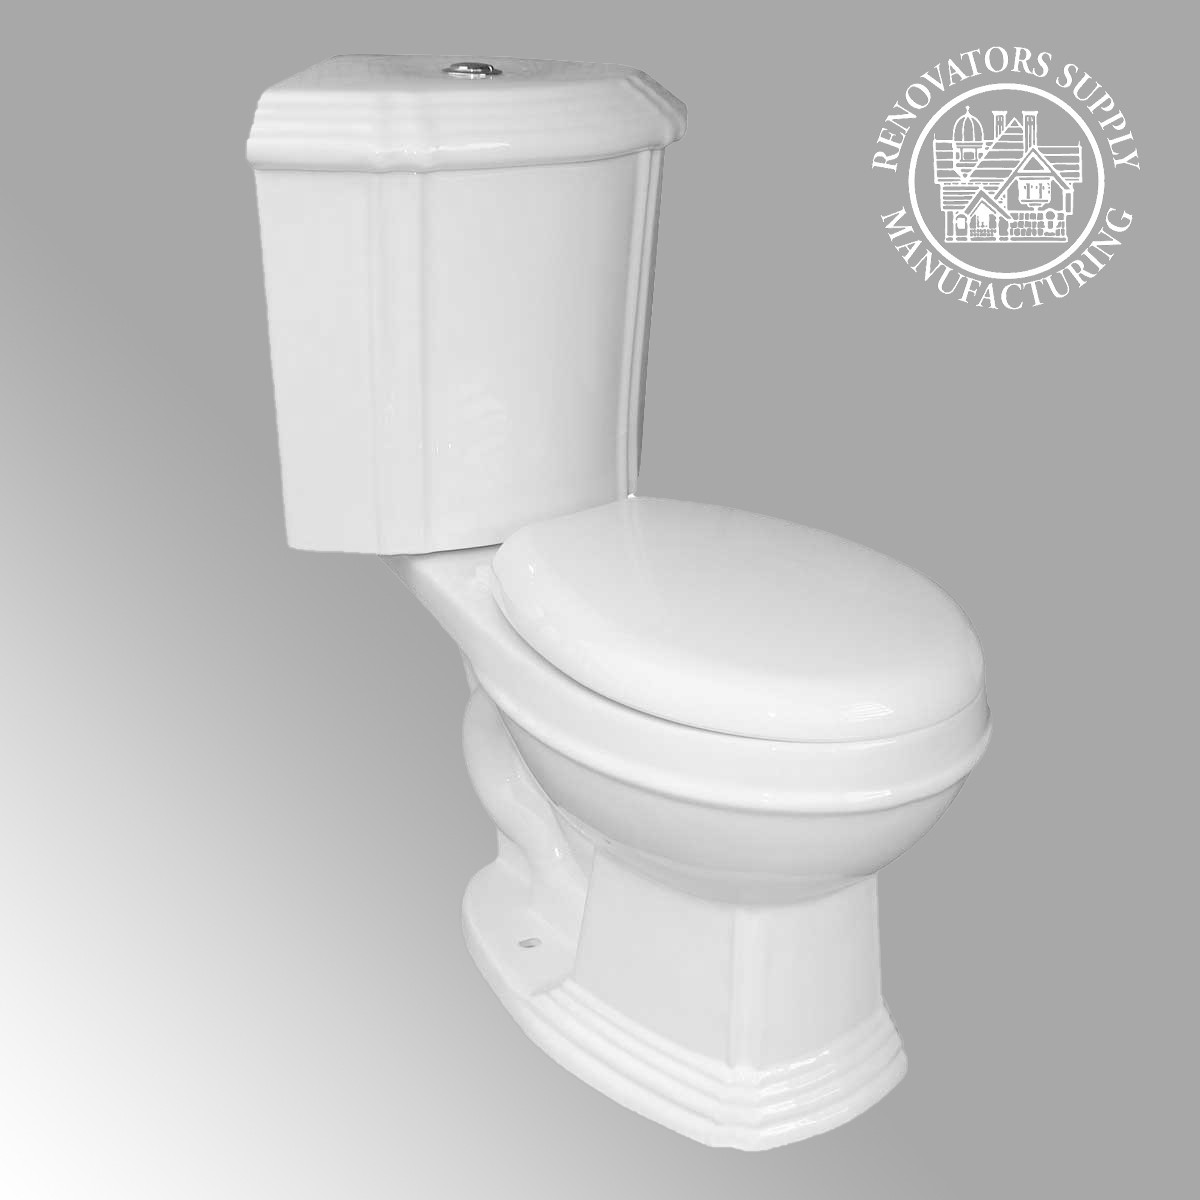 white ceramic corner toilet round space saving button dual flush water saver